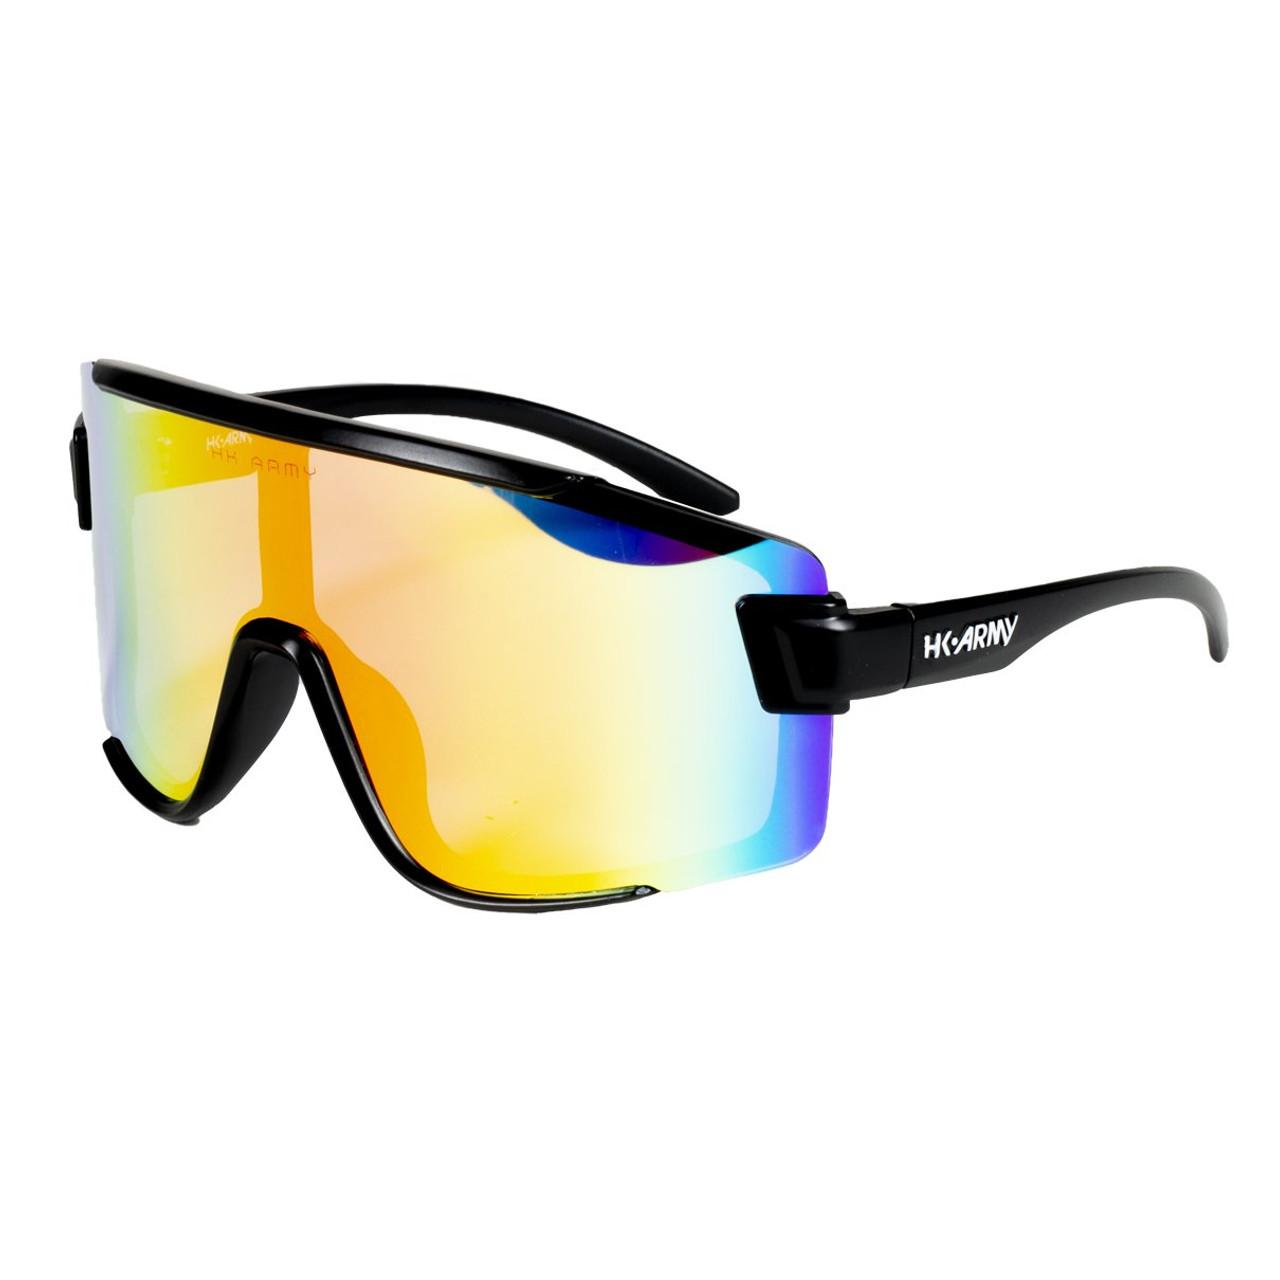 HK - Turbo - Sunglasses - Blaze